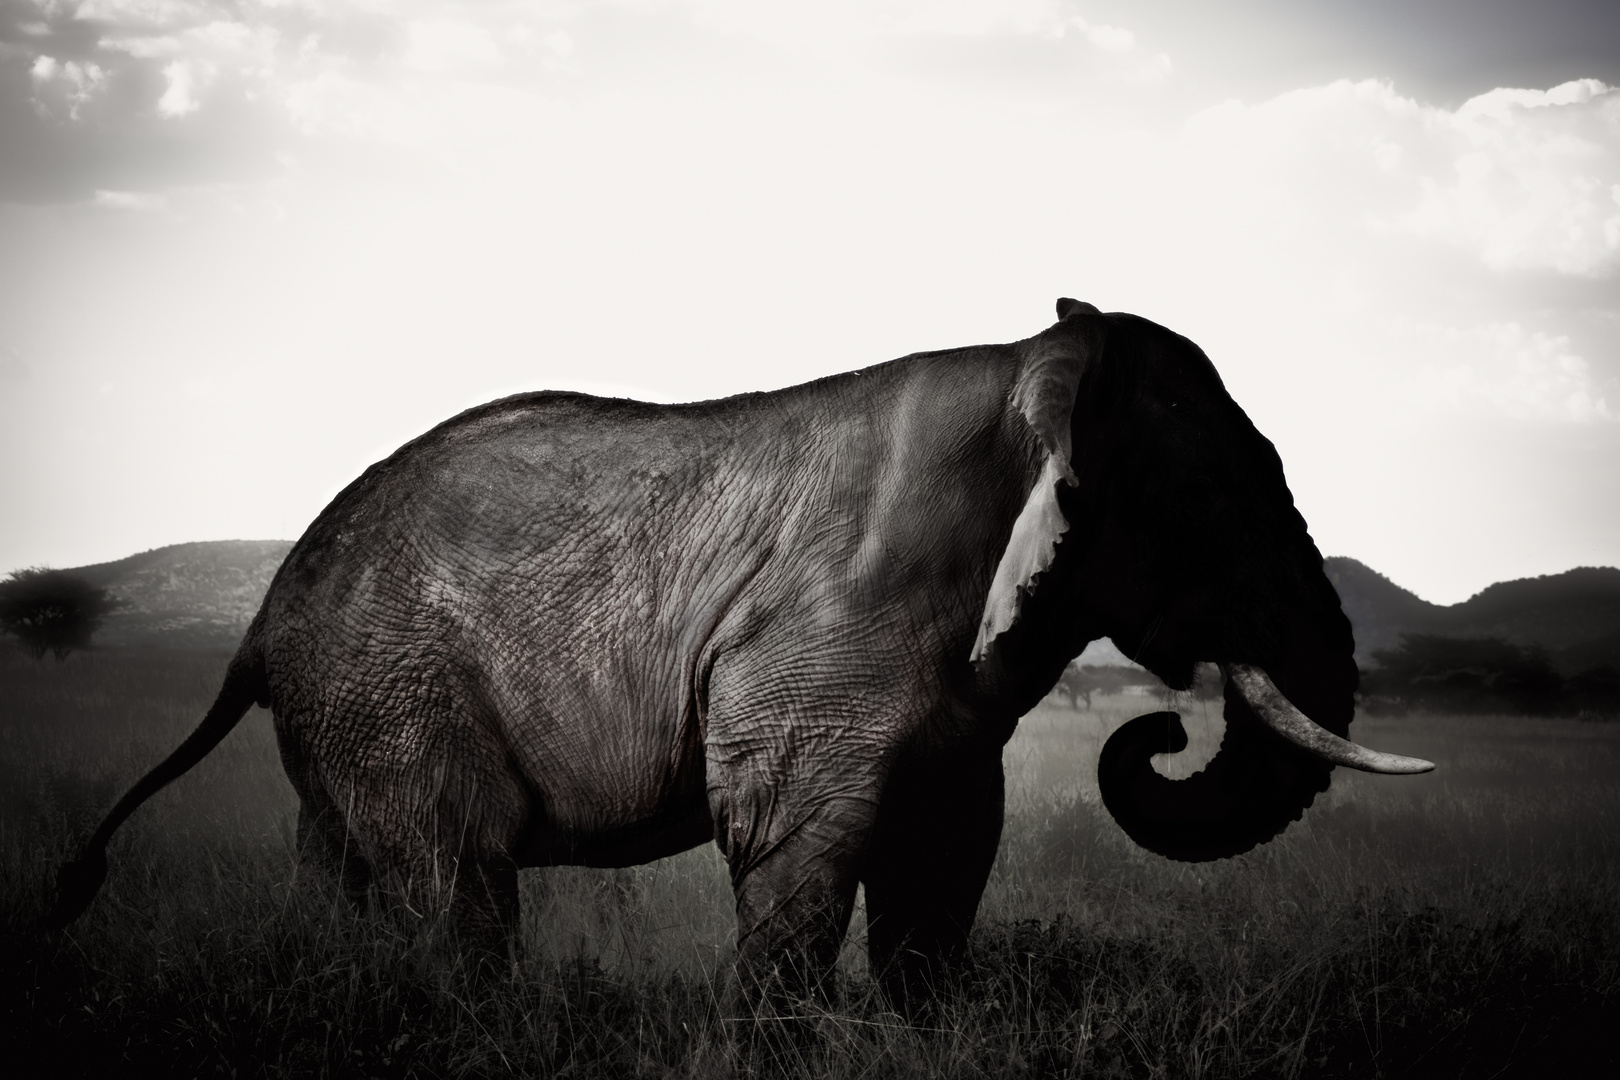 Faceless Elephant